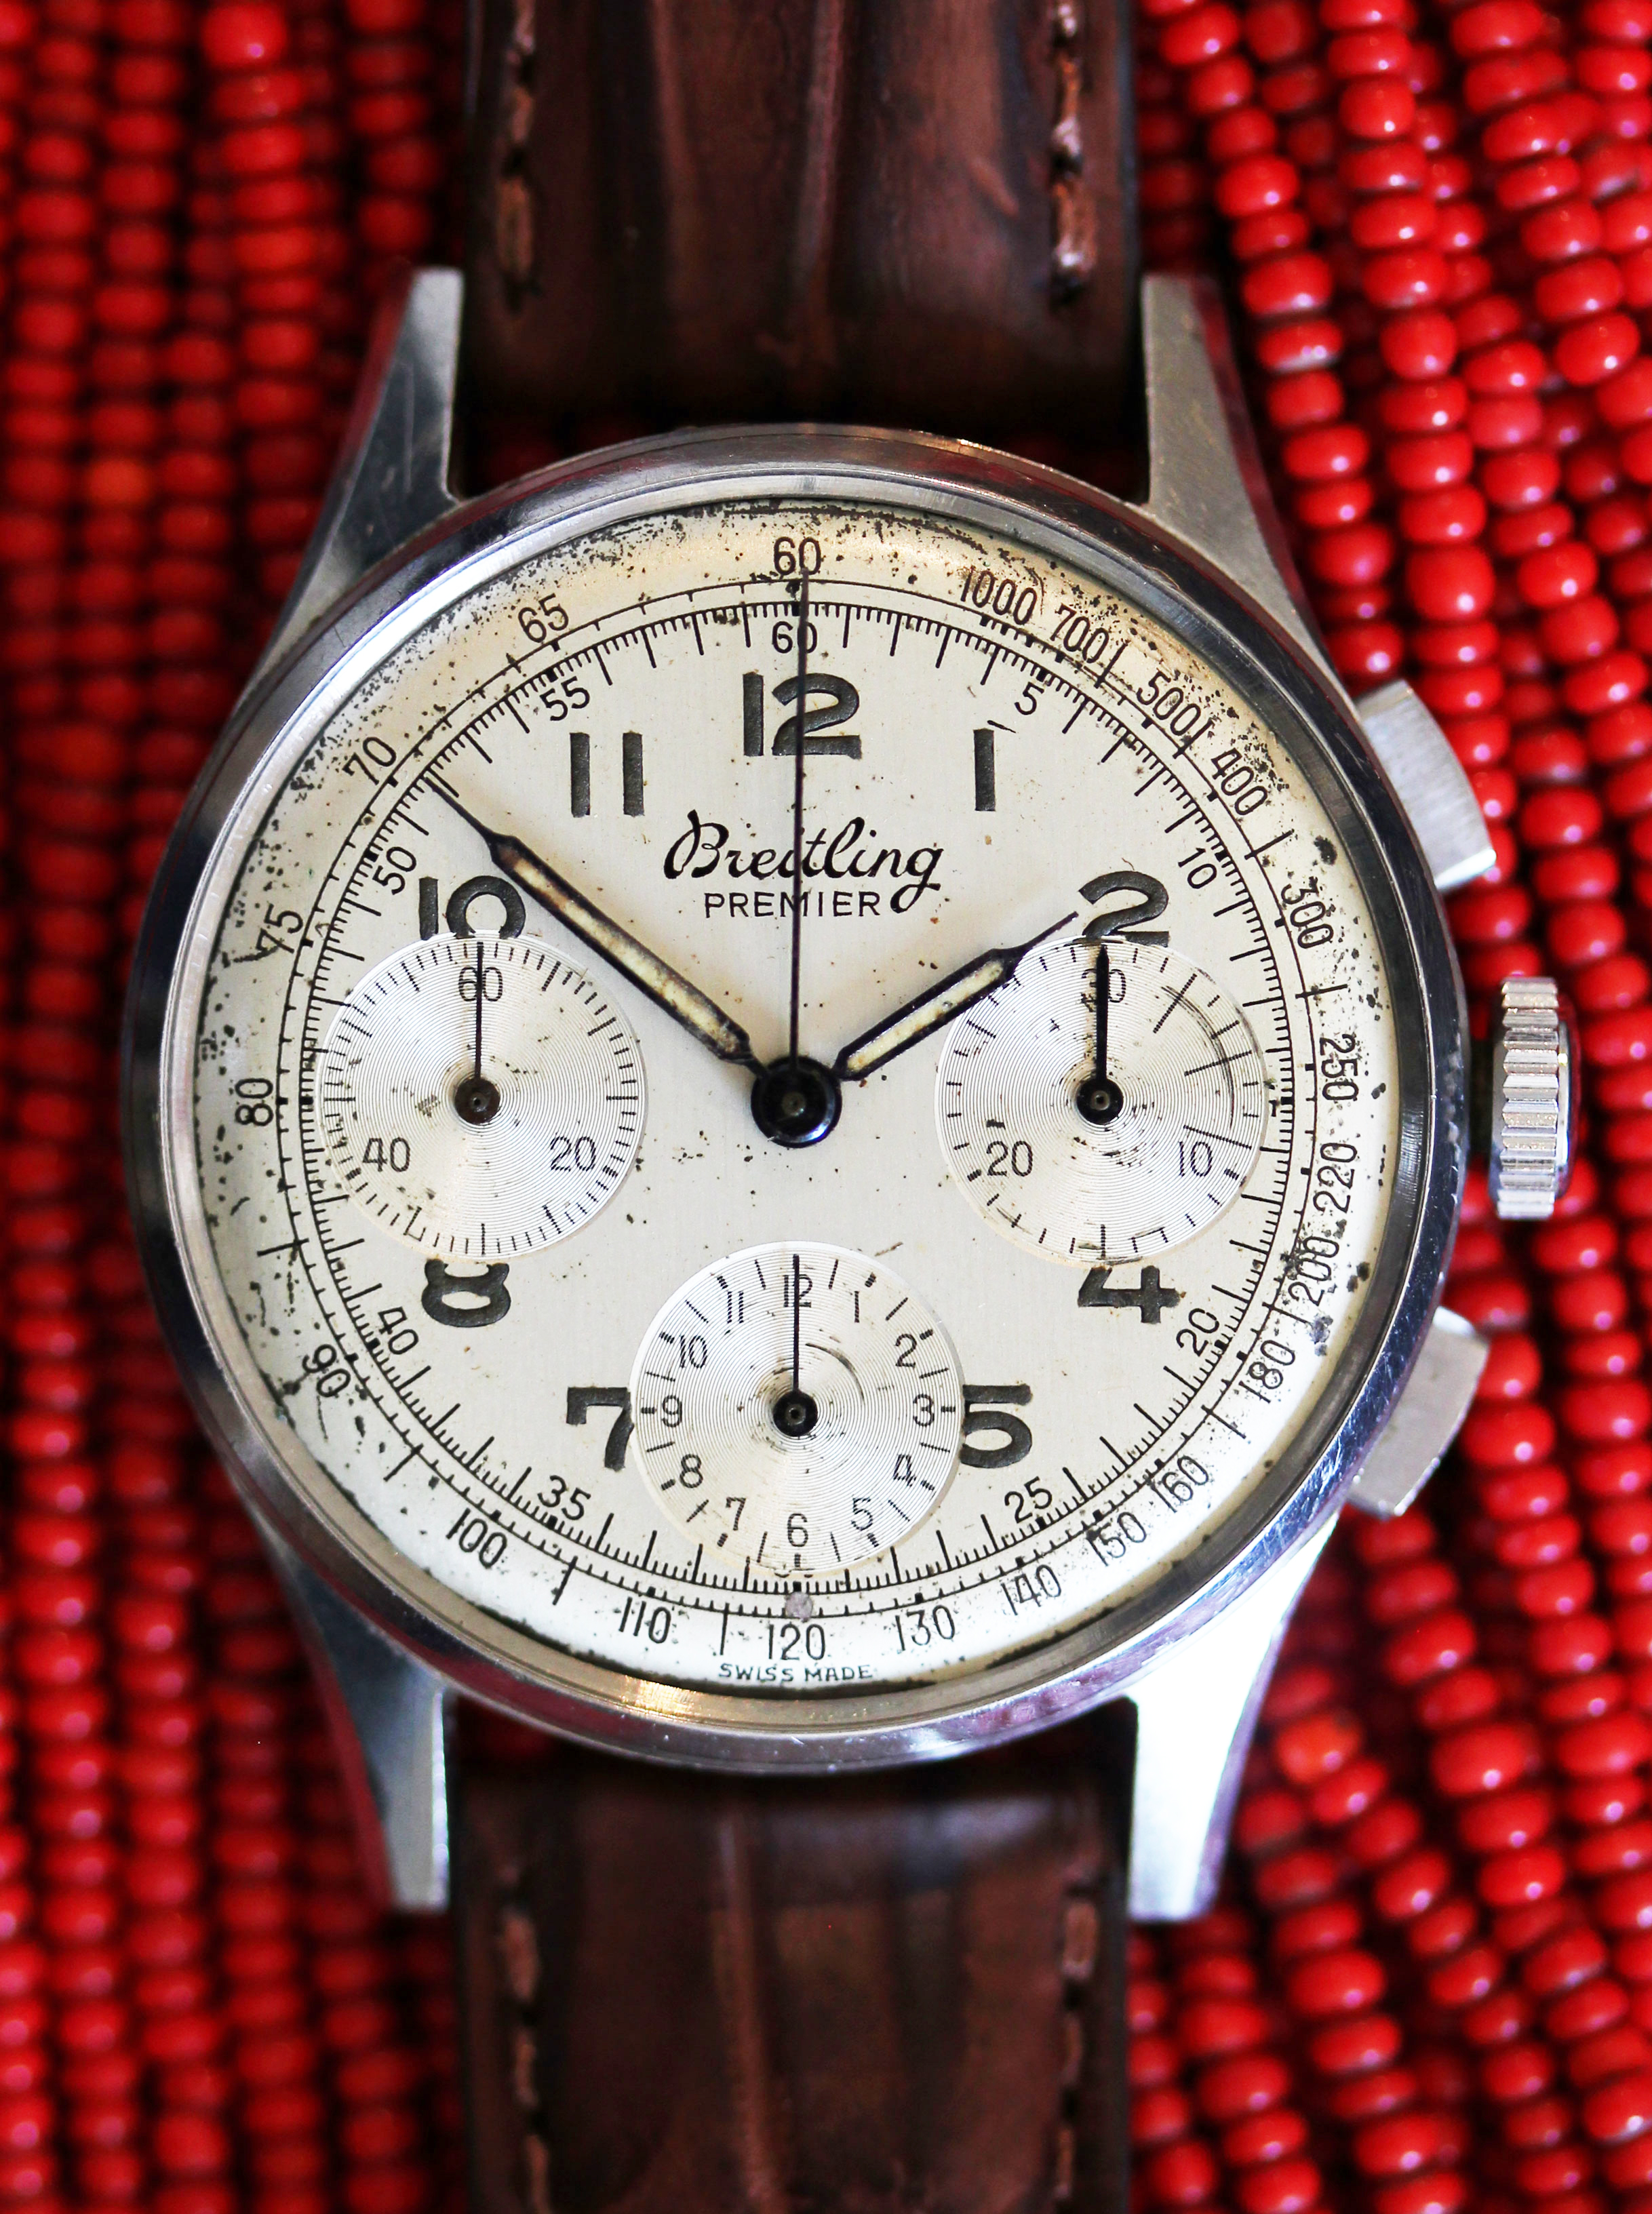 Breitling Premier chronograph ref. 787